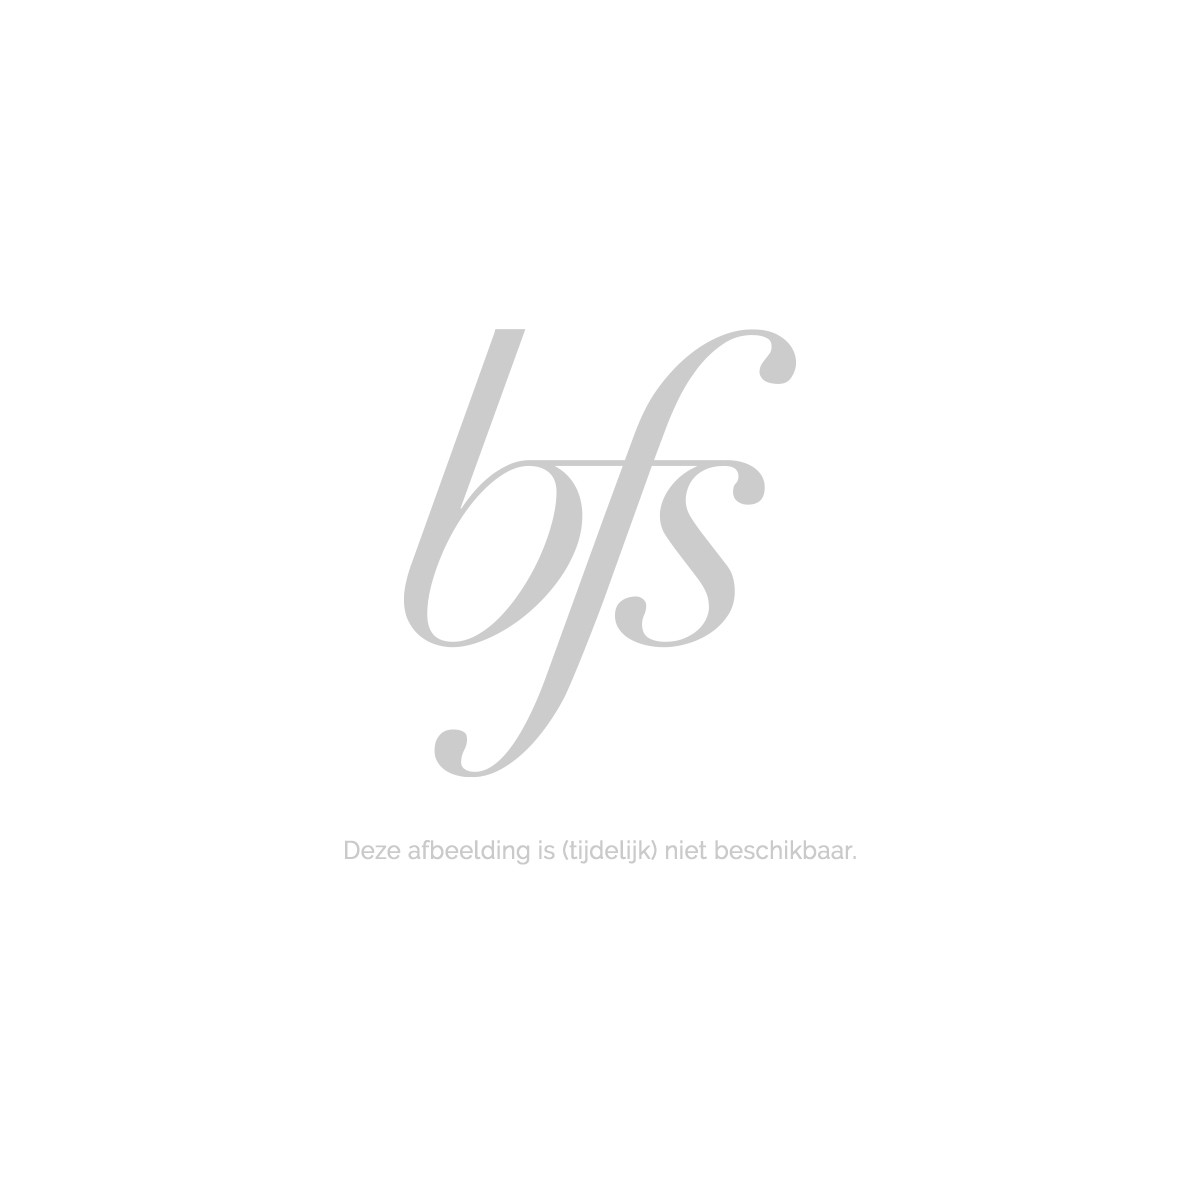 Dr. Eckstein Beautipharm Body Moisturizer LSF 15